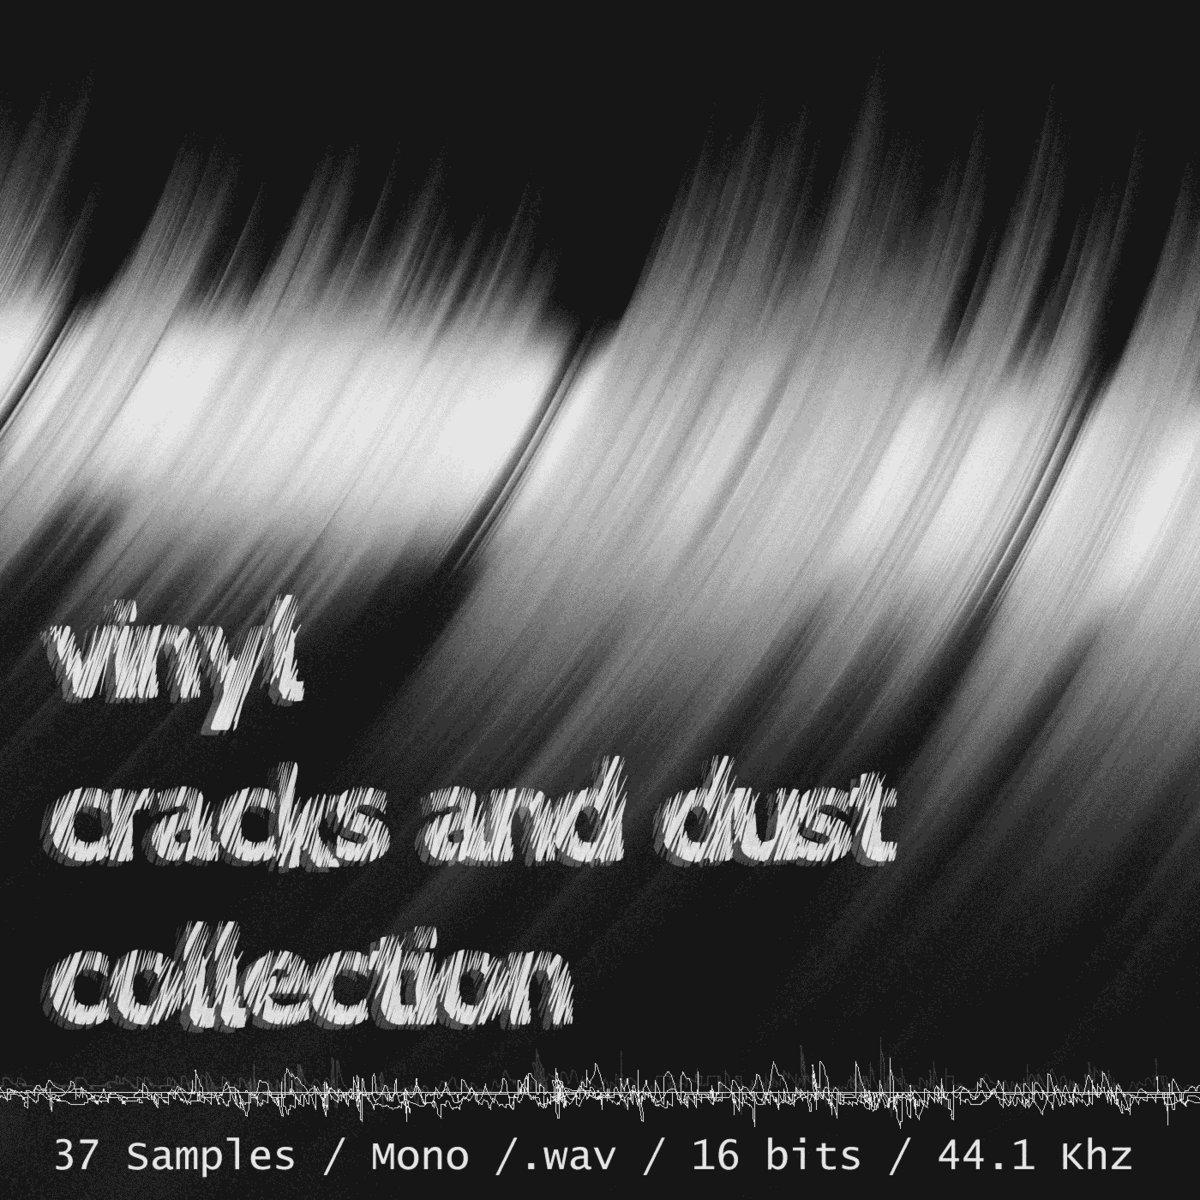 Vinyl Cracks & Dust Collection (Free Download)   Audio Wanderer